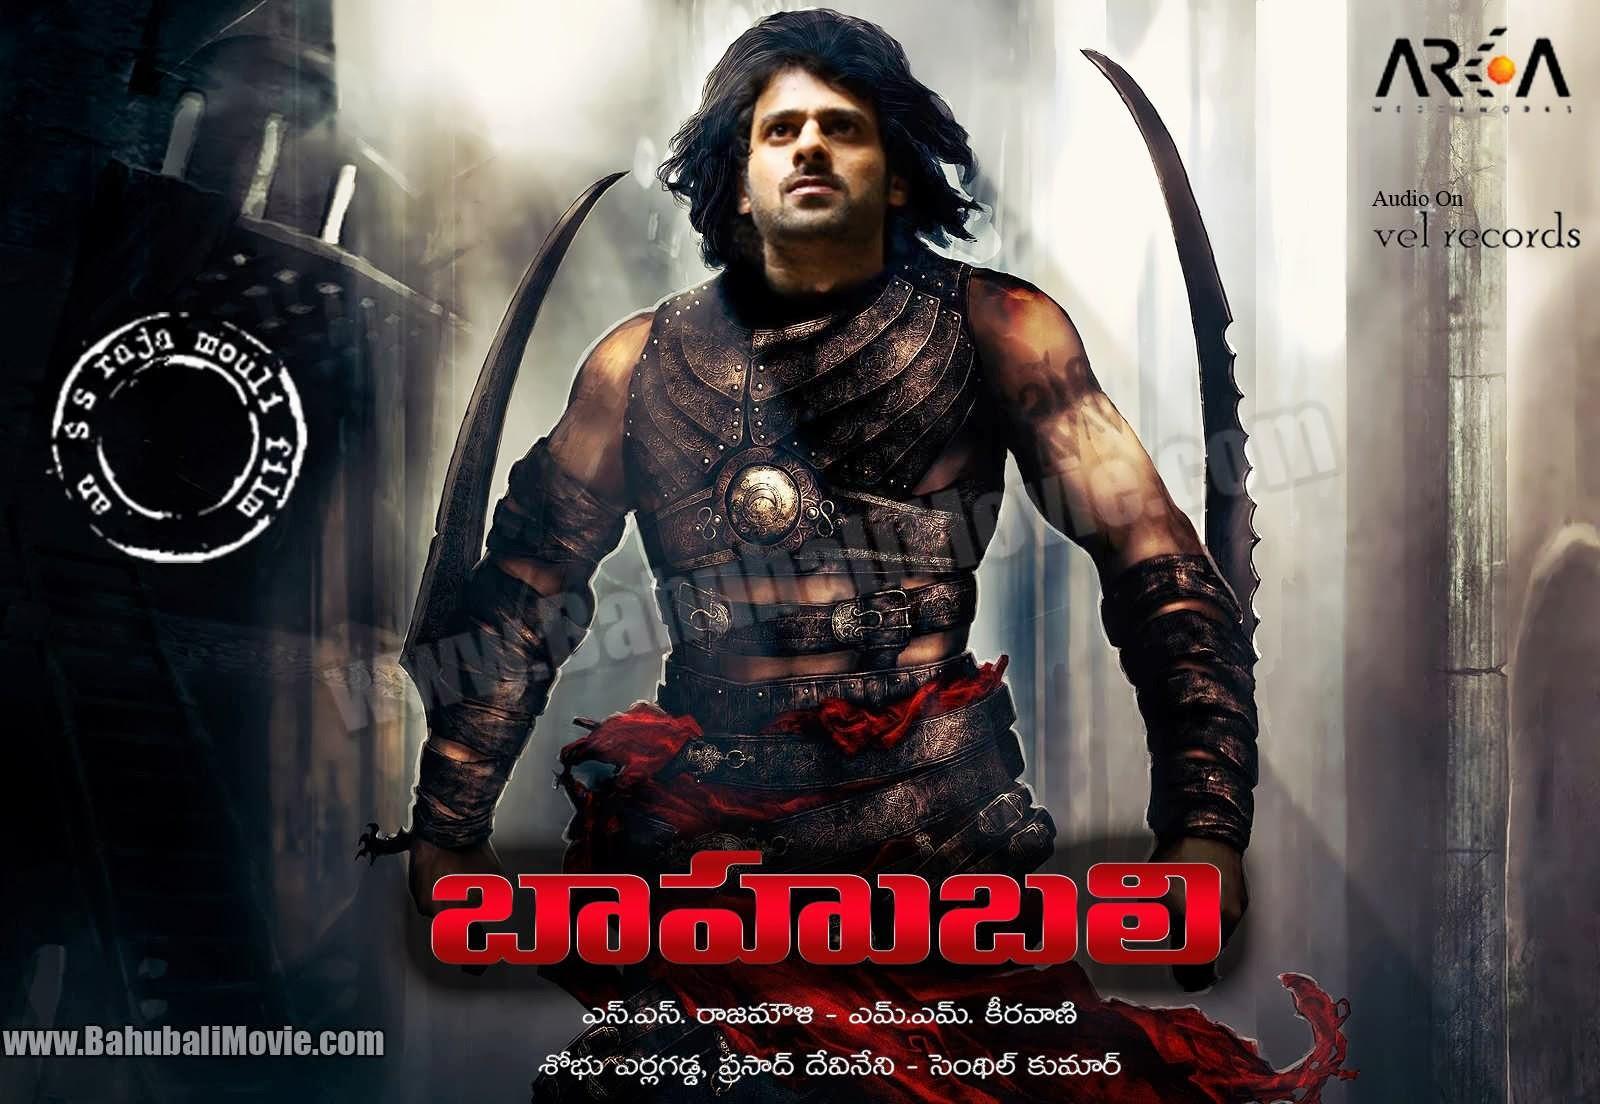 Latest Telugu Movies 2015 Full Movie Bahubali Mujihi Na Otoko